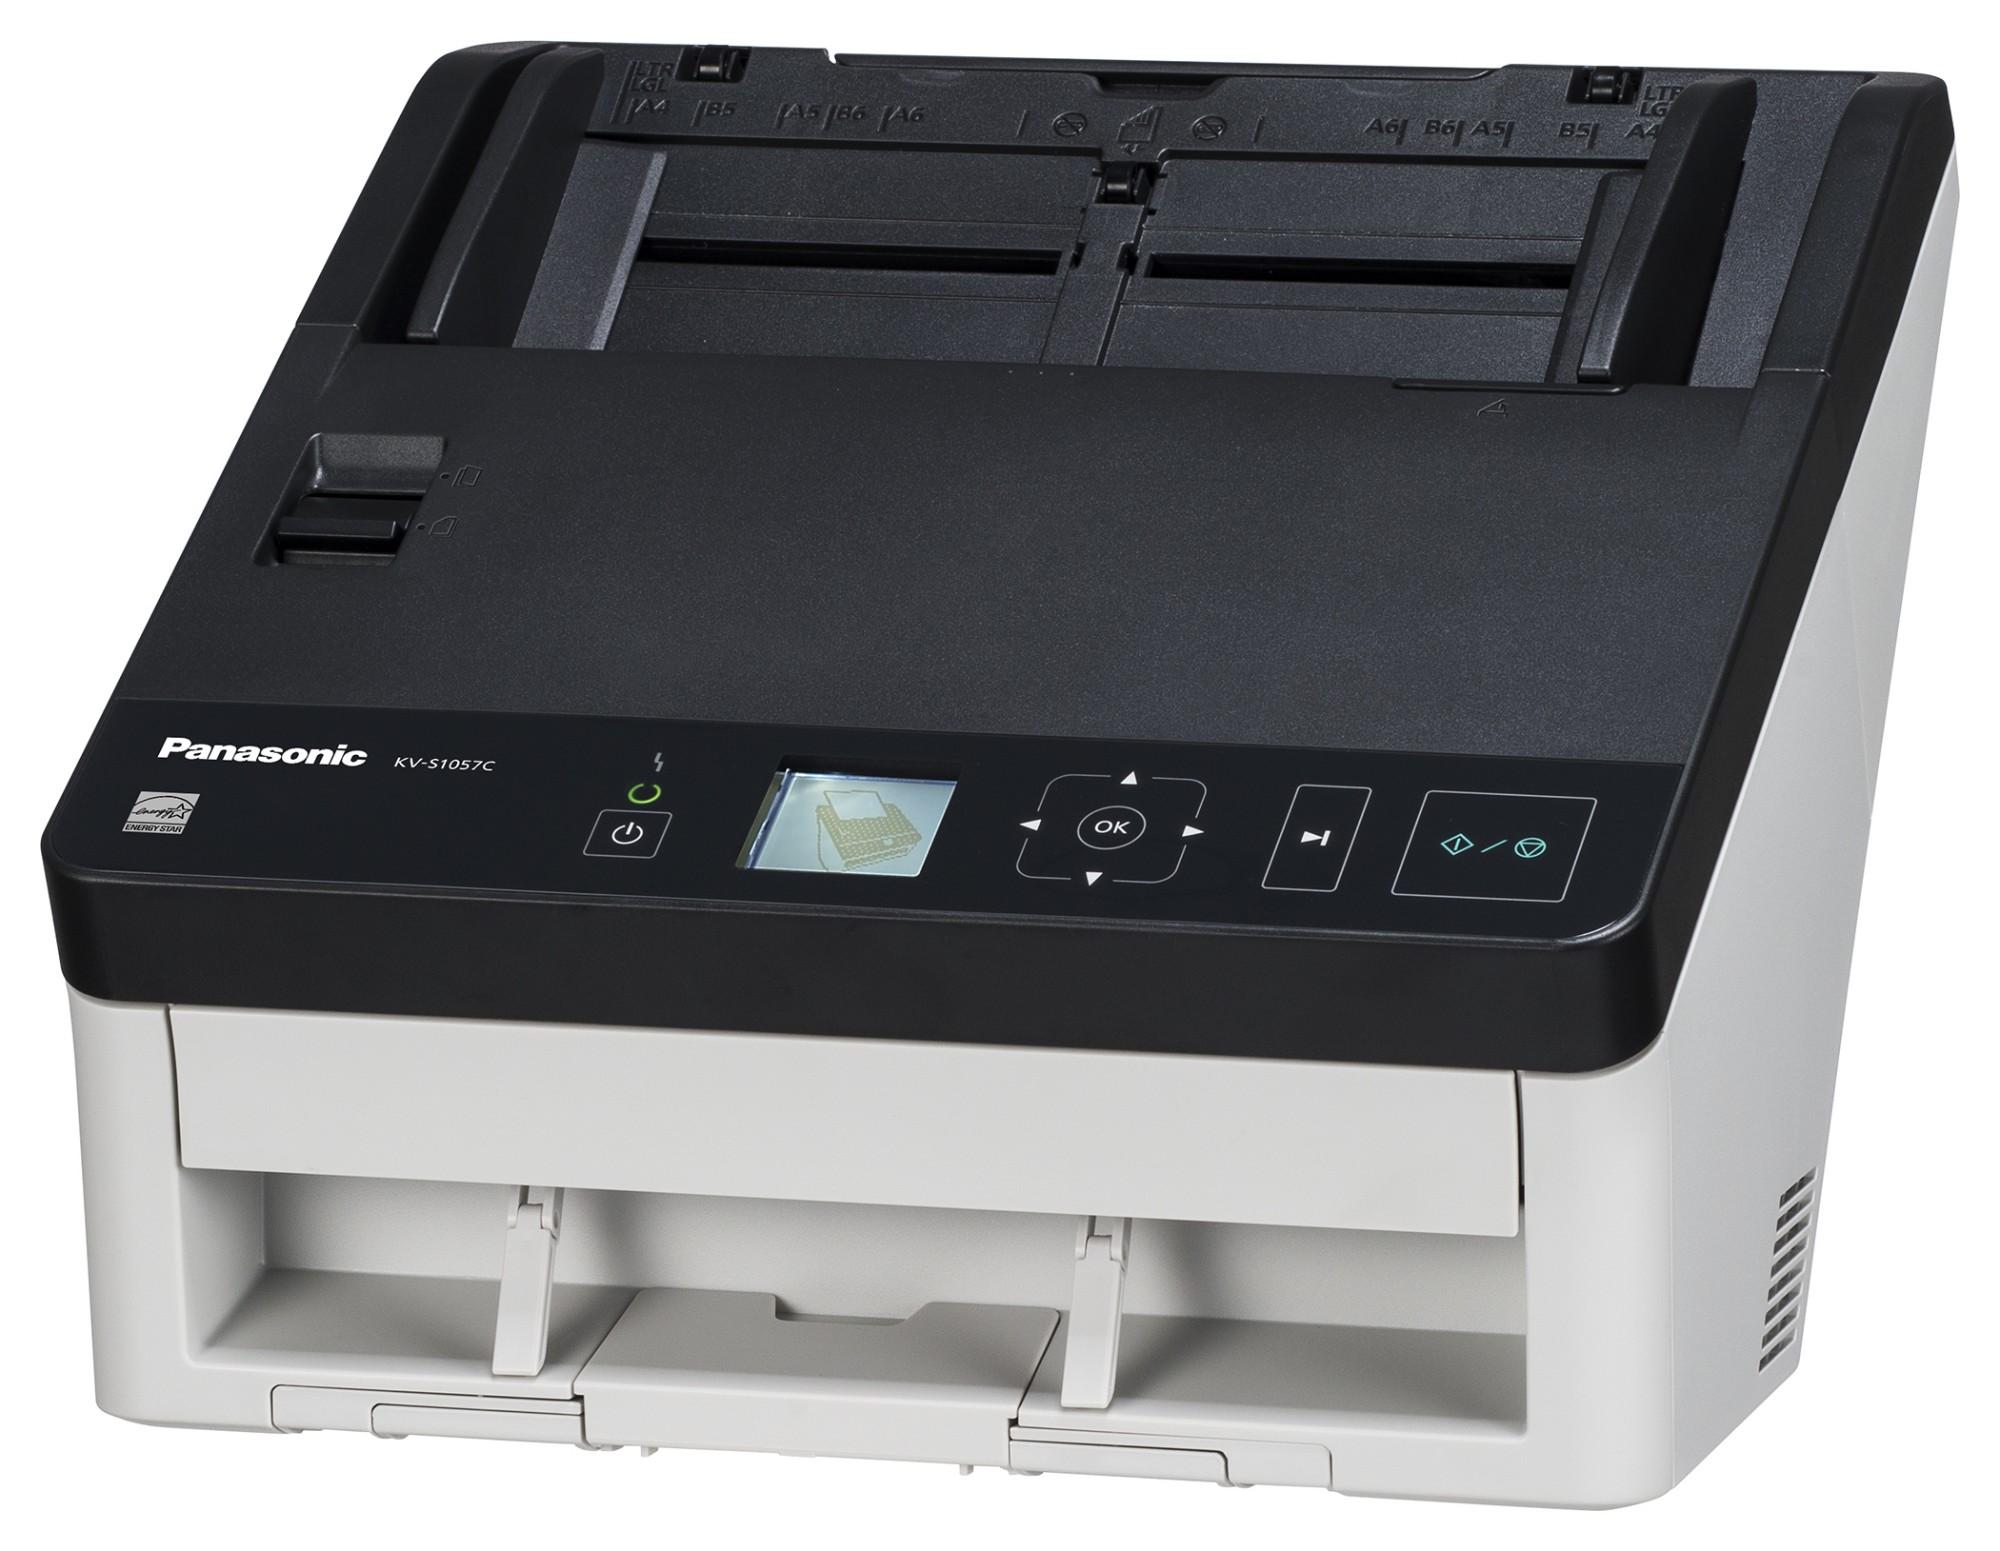 Panasonic KV-S1057C-U scanner 600 x 600 DPI ADF scanner Black,White A4